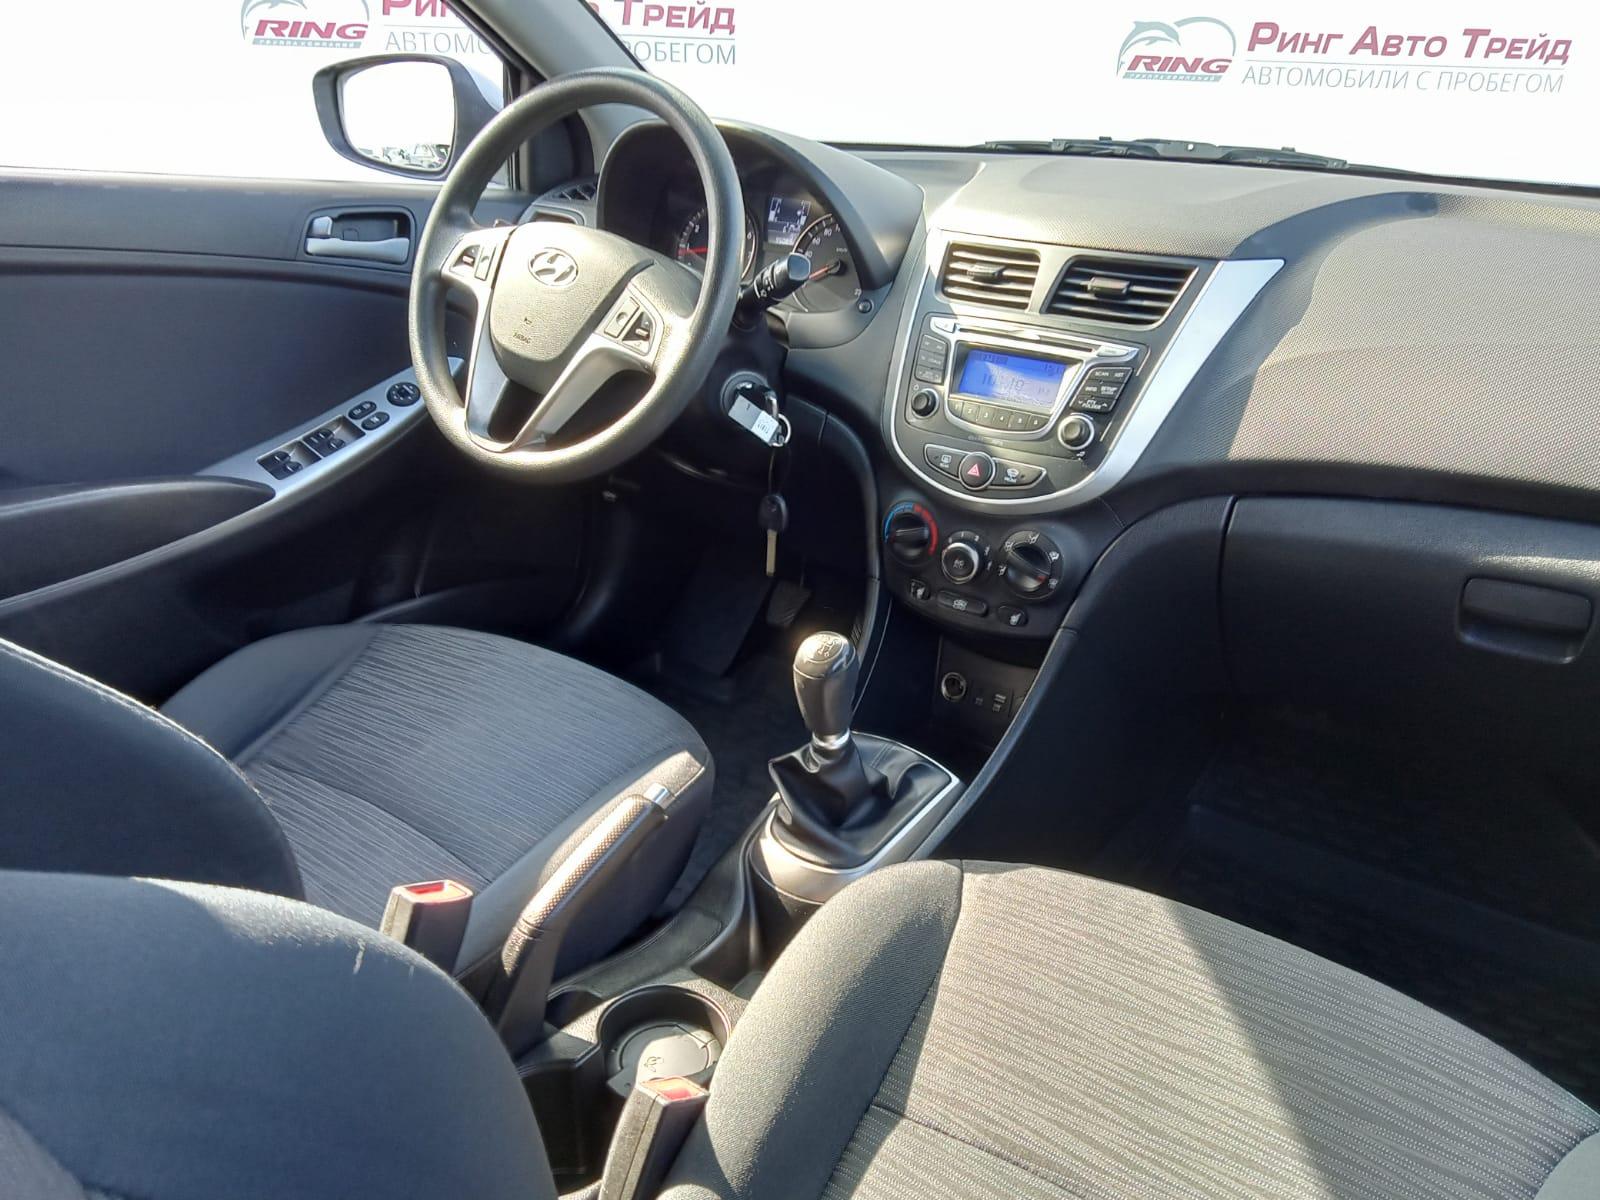 Hyundai Solaris Седан (2016г.)